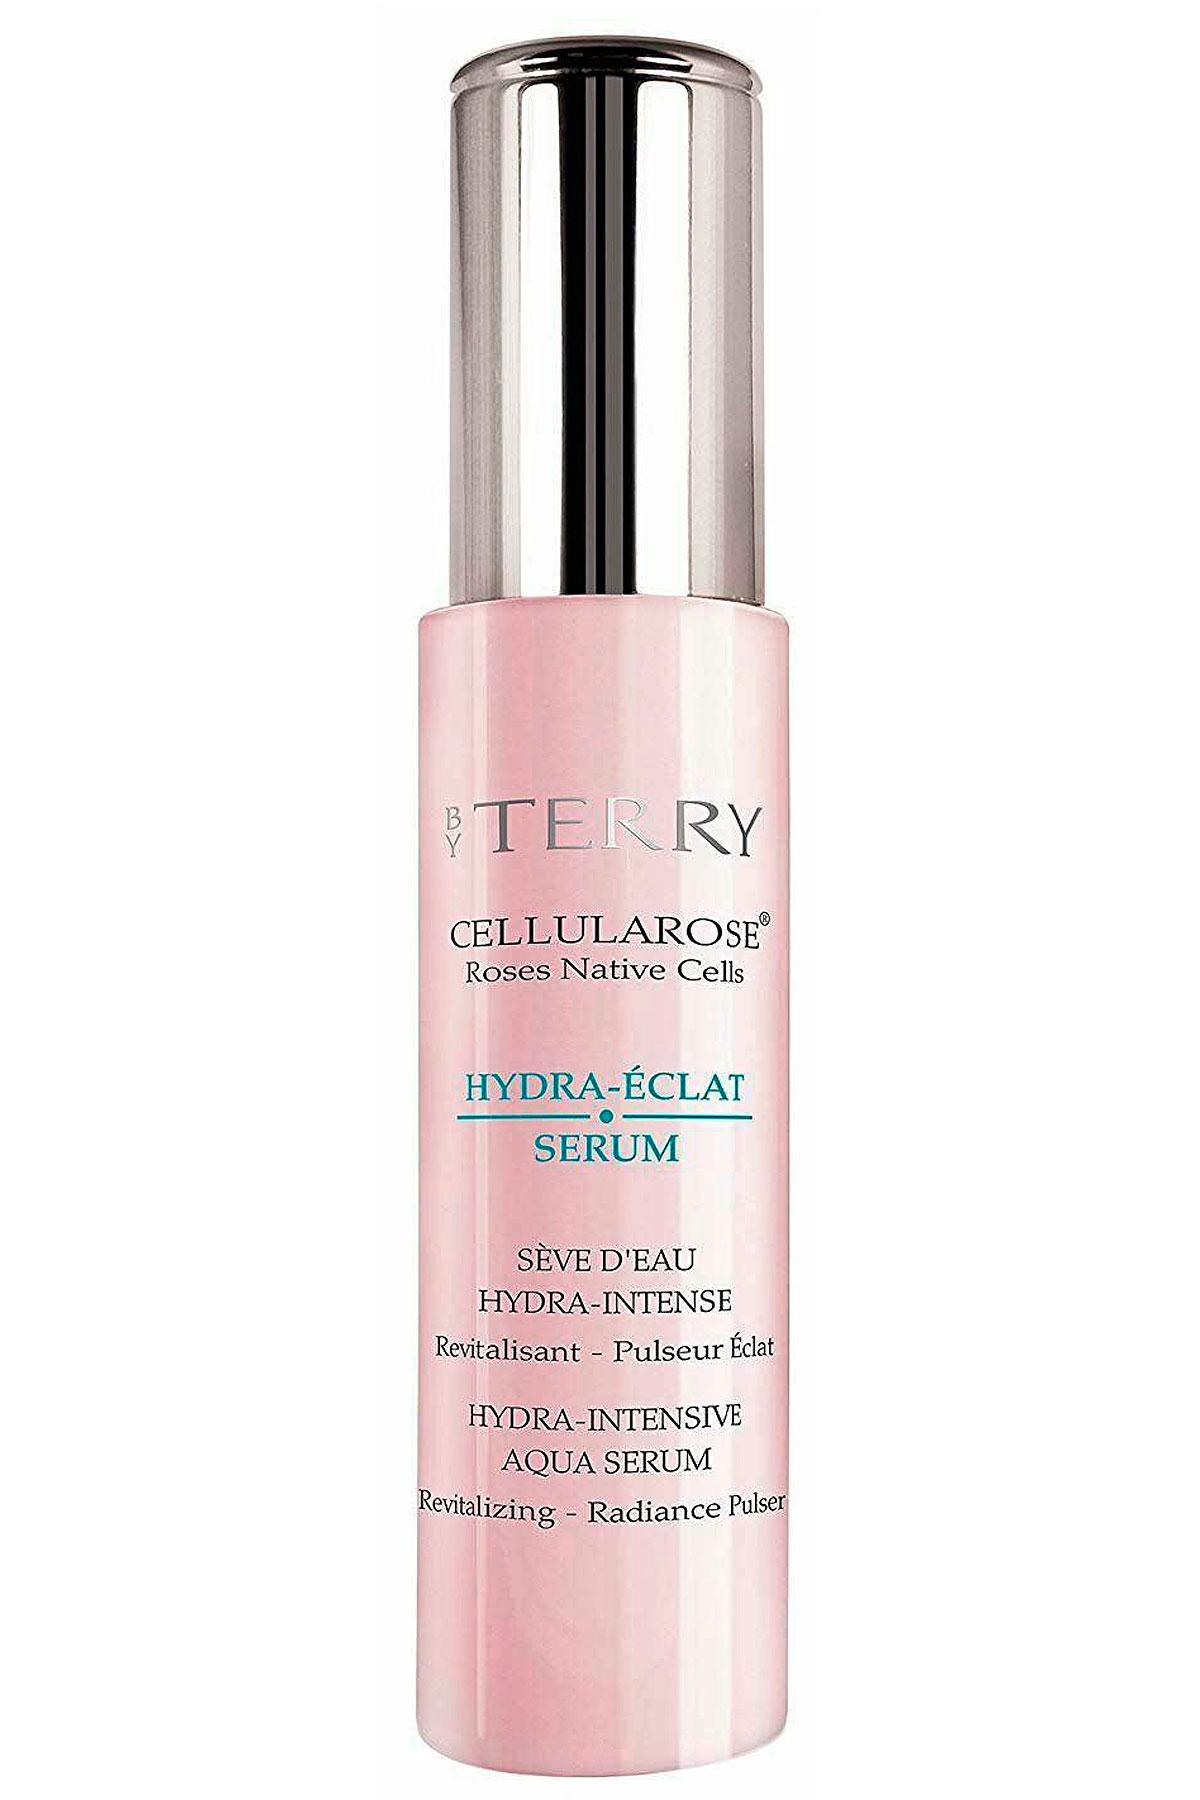 By Terry Beauty for Women On Sale, Hydra Eclat - Serum - 30 Ml, 2019, 30 ml